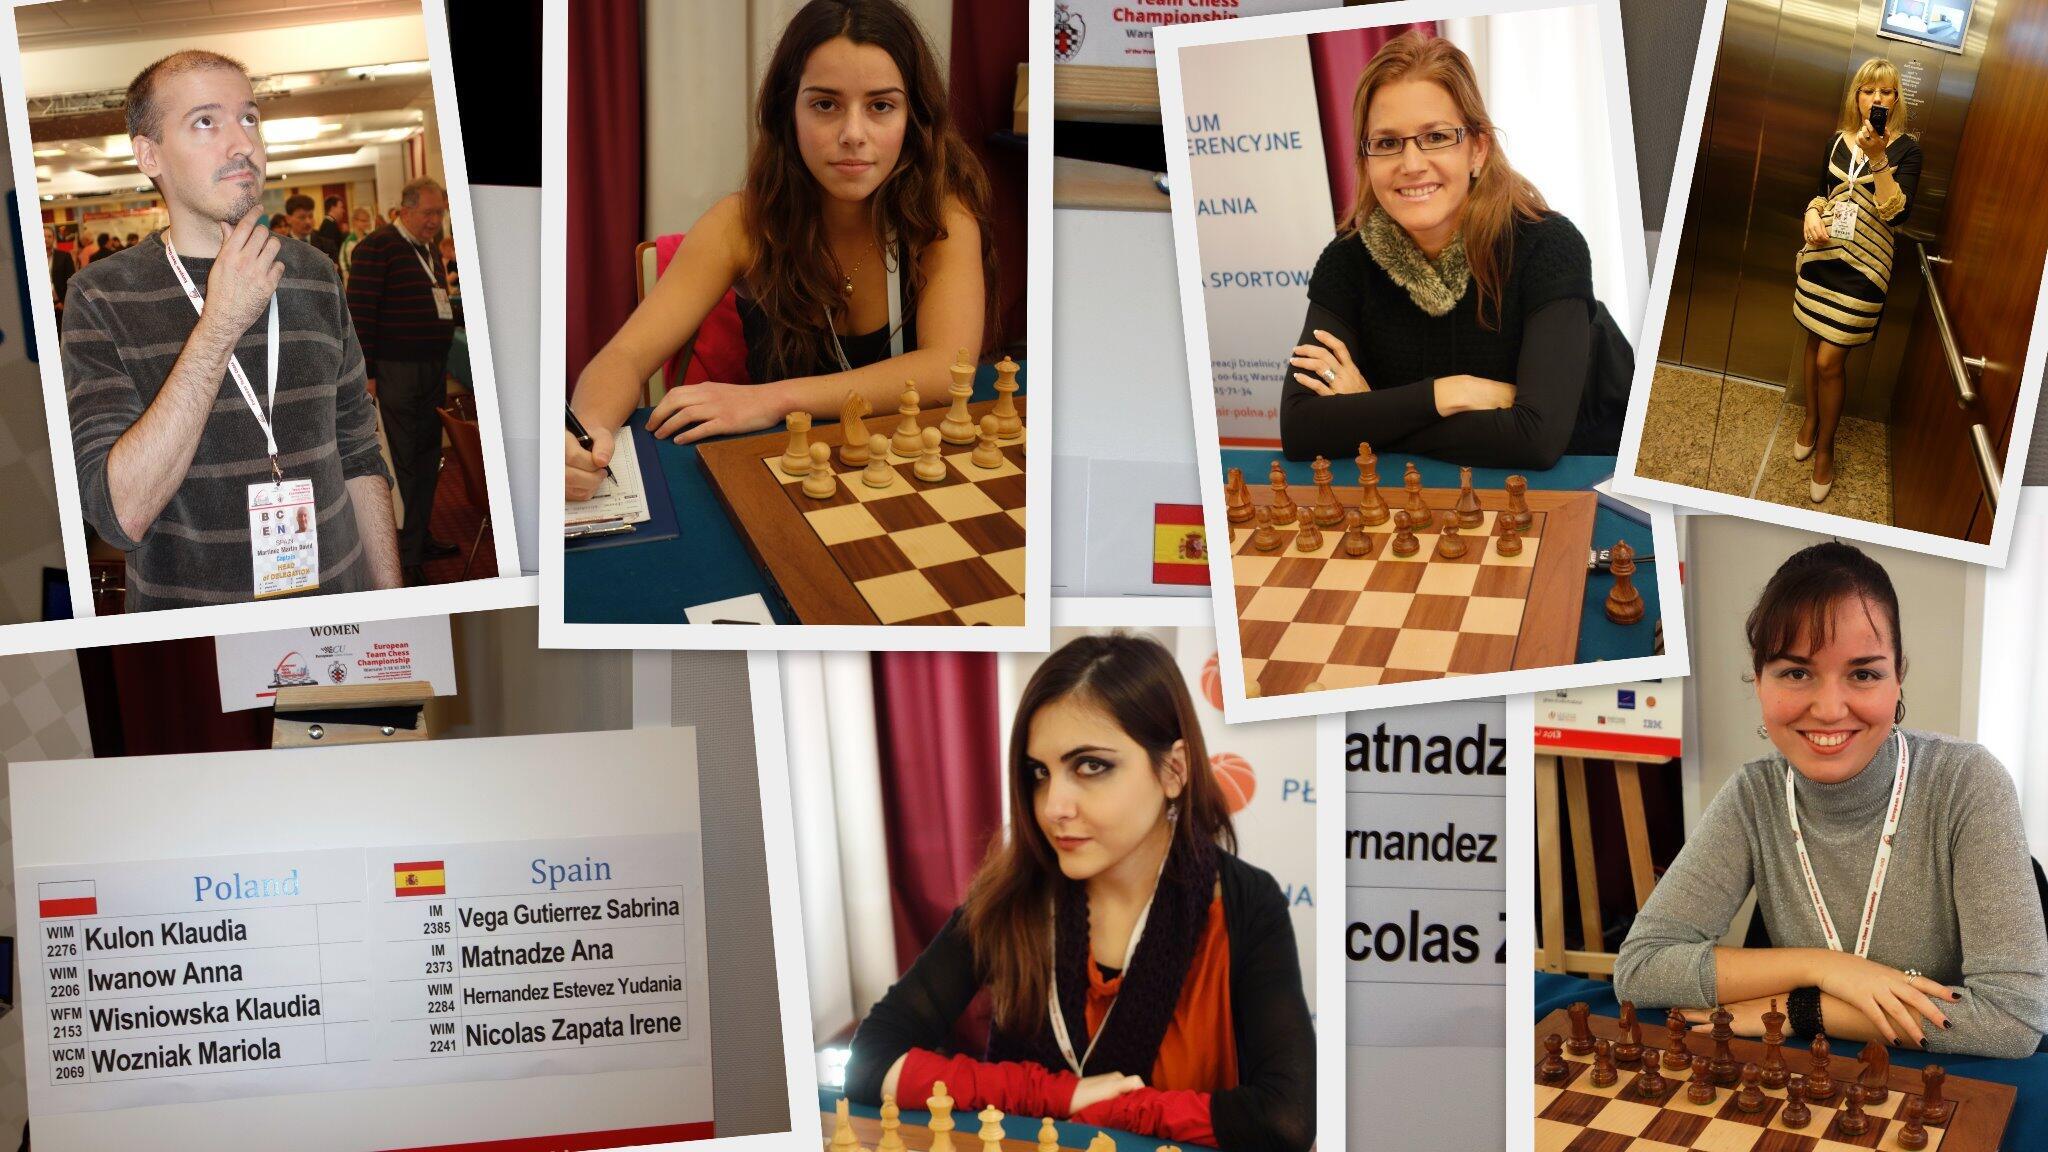 RT @chessolja: Nuestro equipo femenino en Varsovia: Sabrina Vega, Ana Matnadze, Yudania Hernández, Irene Nicolás y David Martínez. http://t.co/OV4jmjBUqv